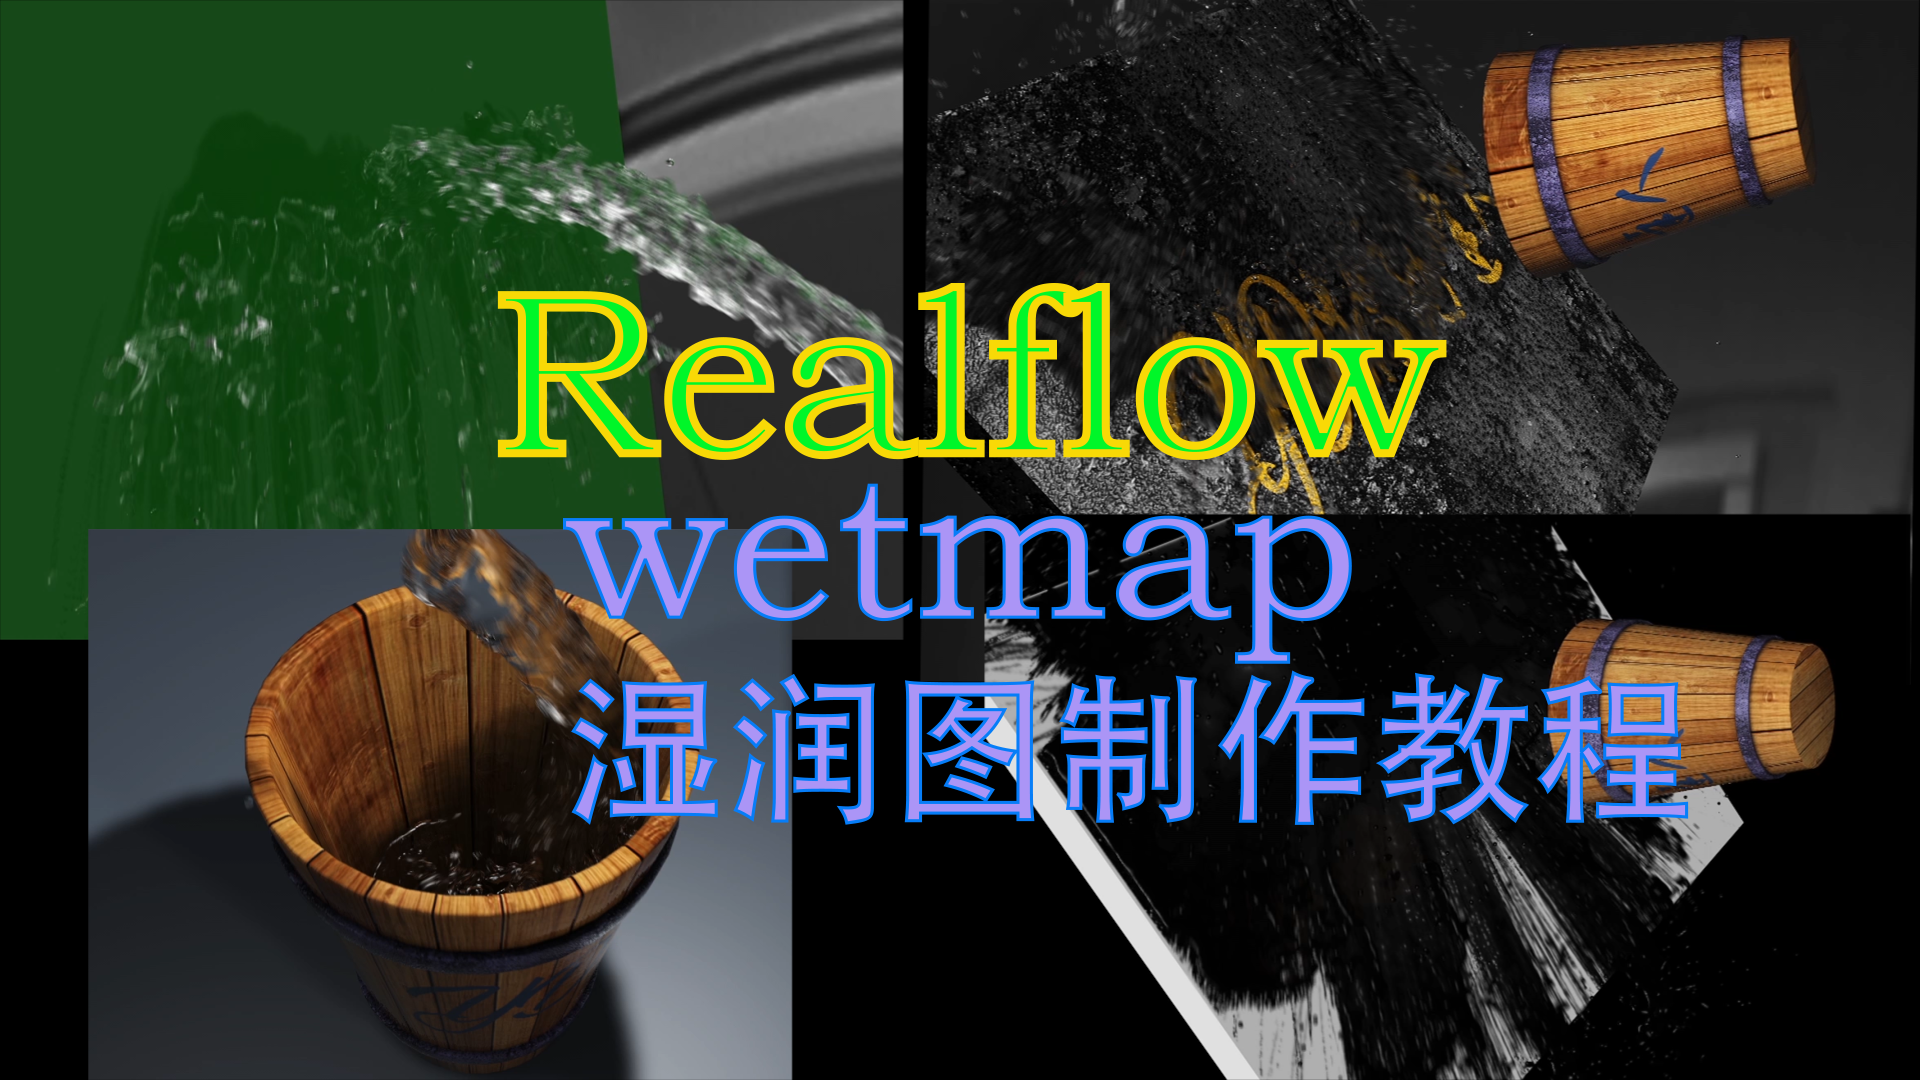 realflow wetmap湿润贴图